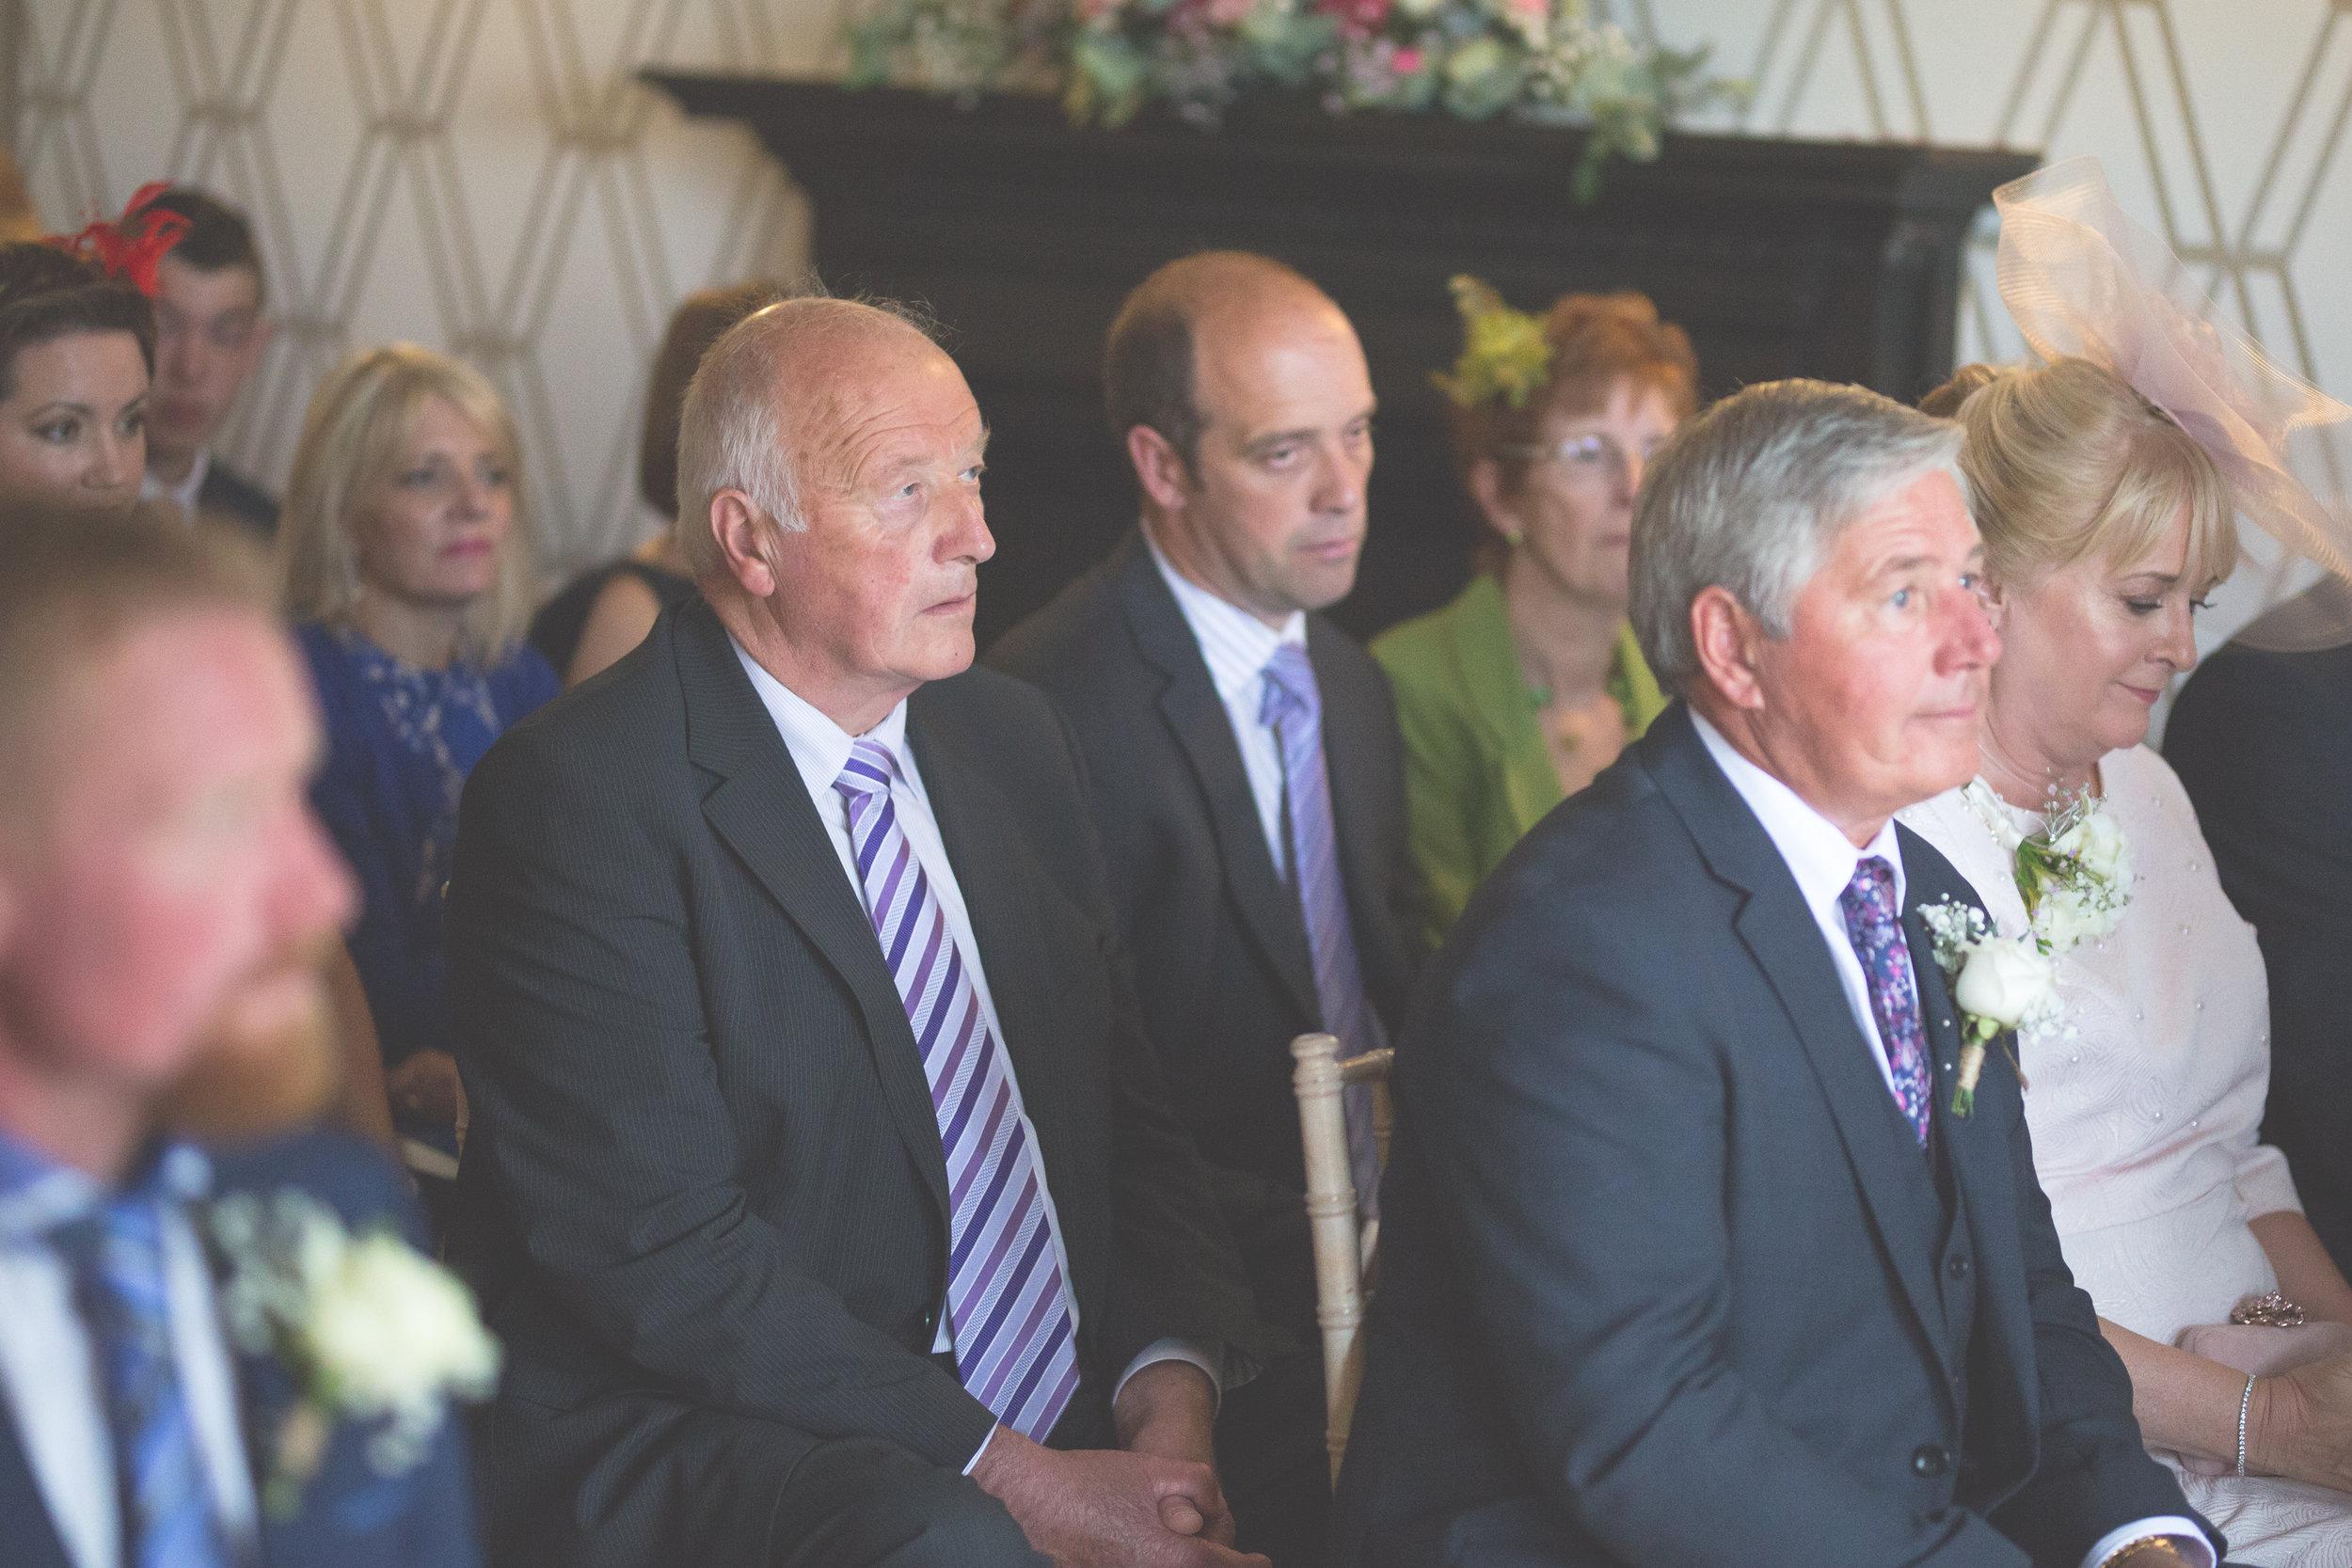 Northern Ireland Wedding Photographer | Brian McEwan | Louise & Darren-240.jpg